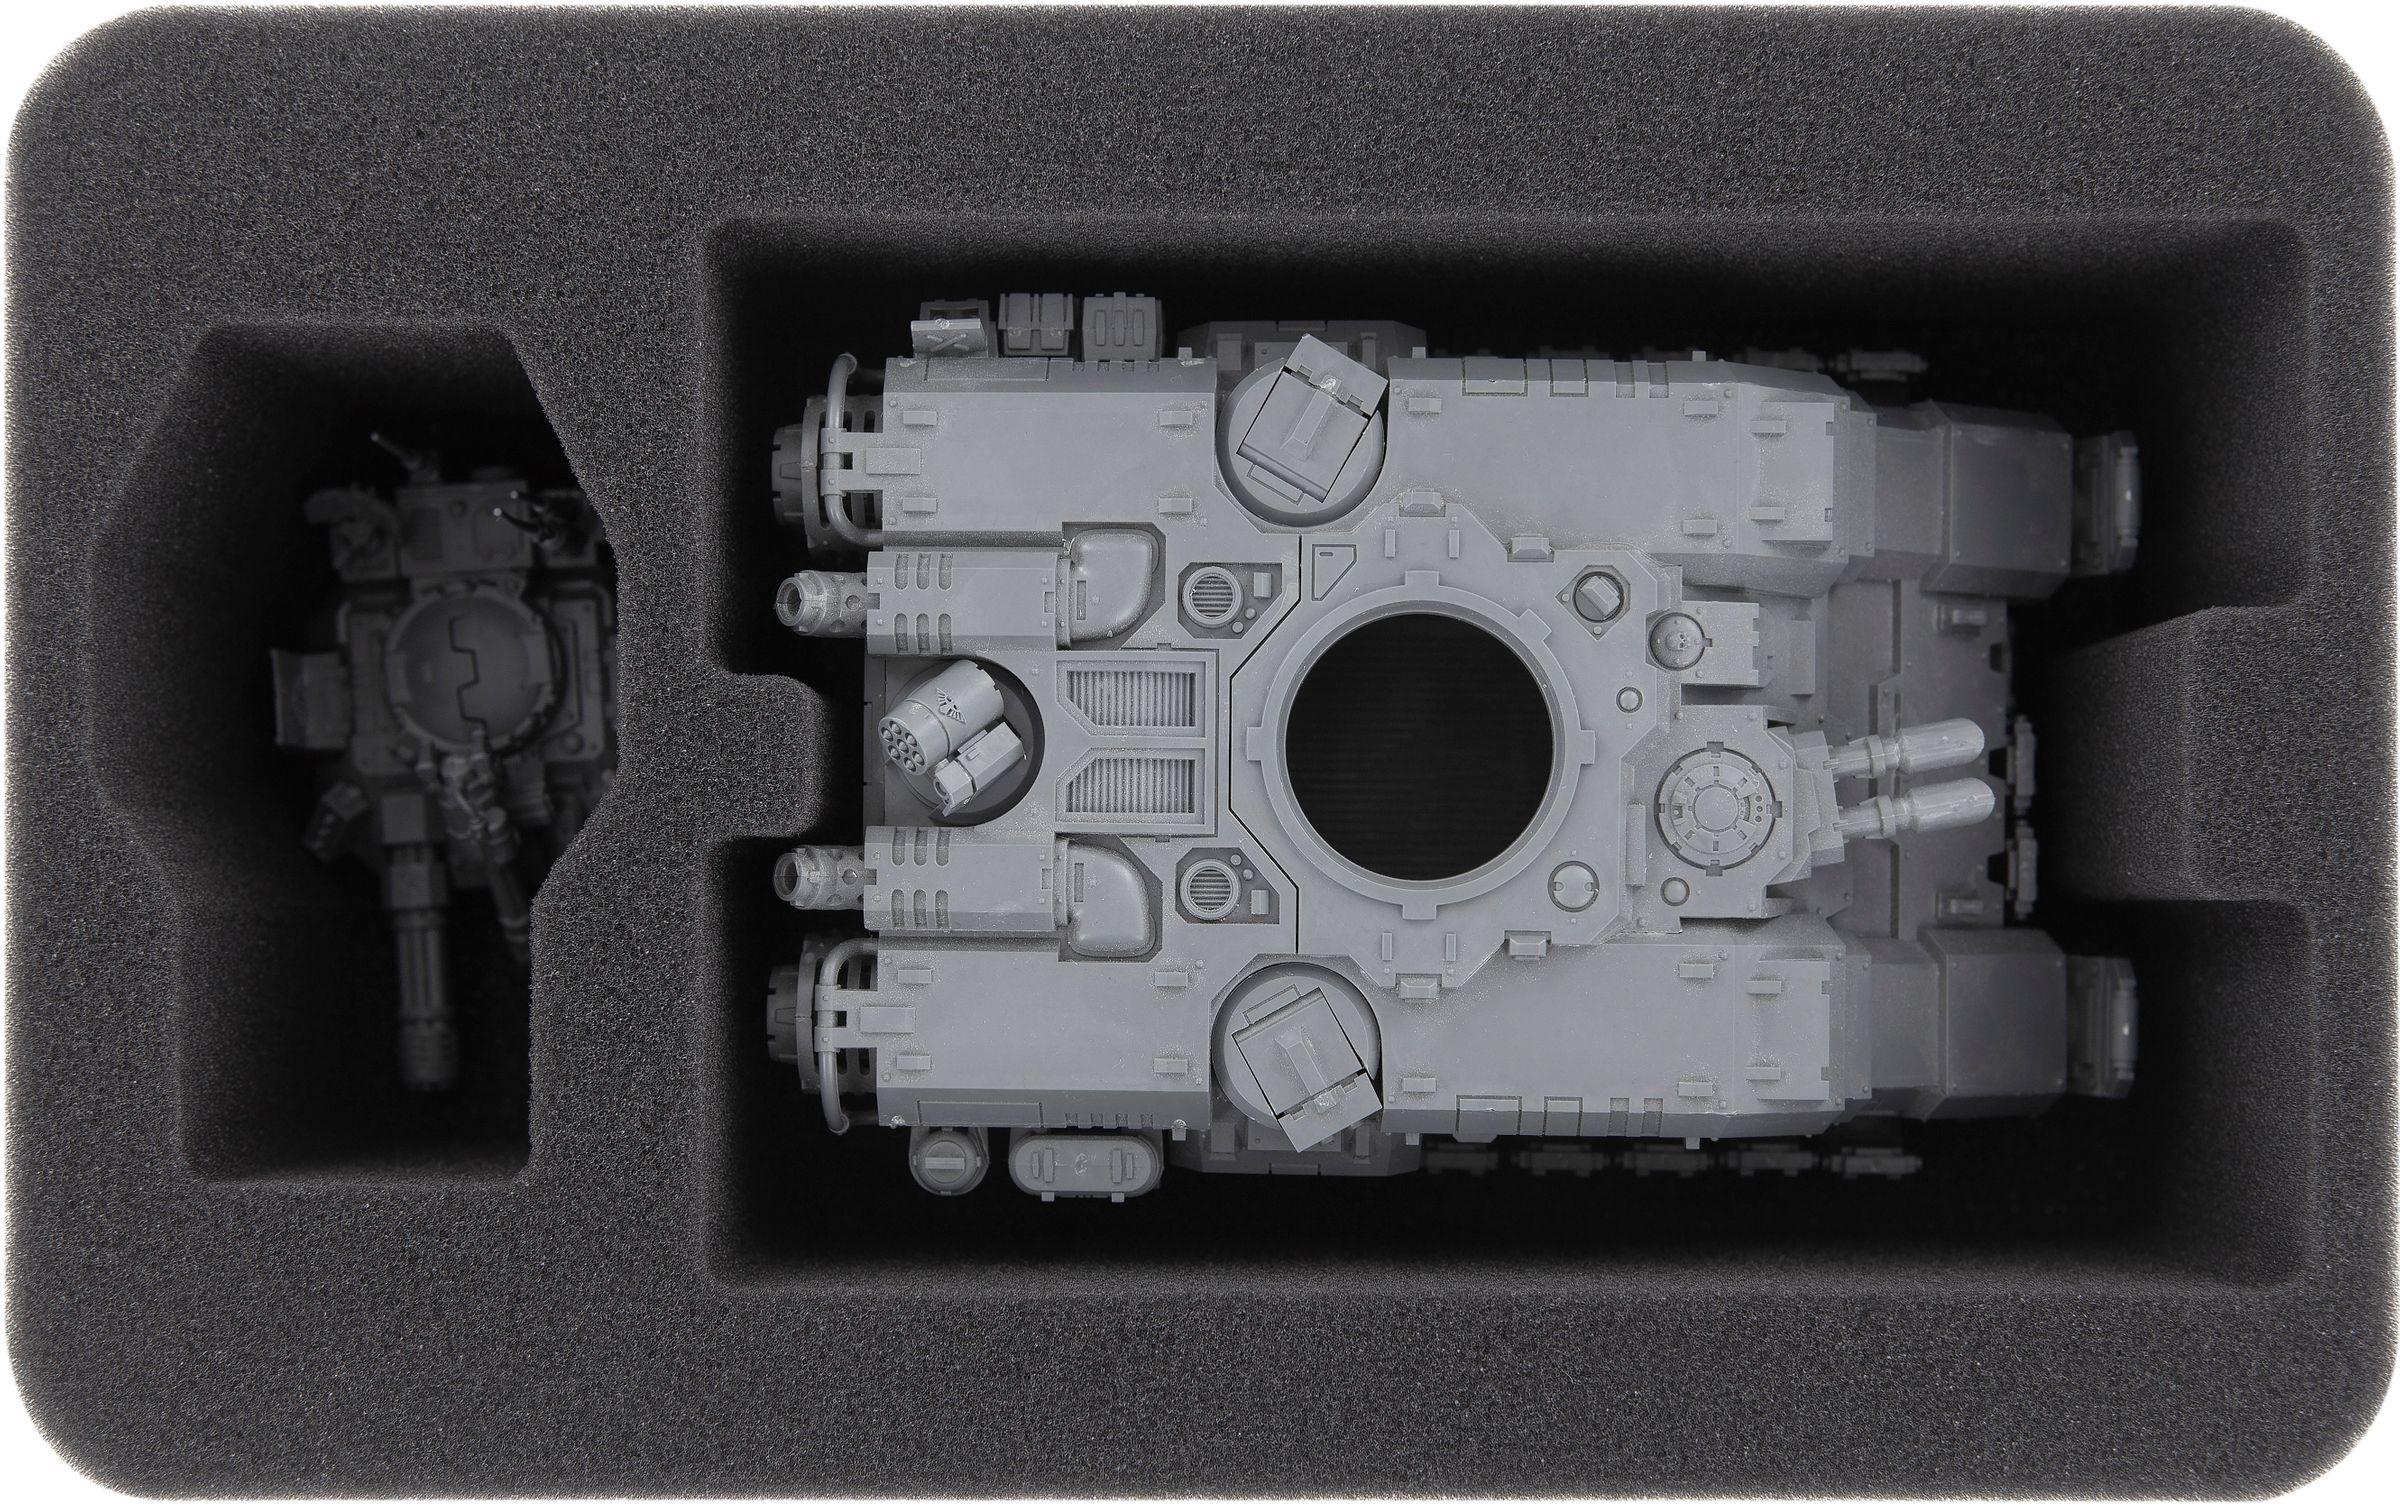 HSMEGC090BO foam tray for Primaris Repulsor | Feldherr Worldwide